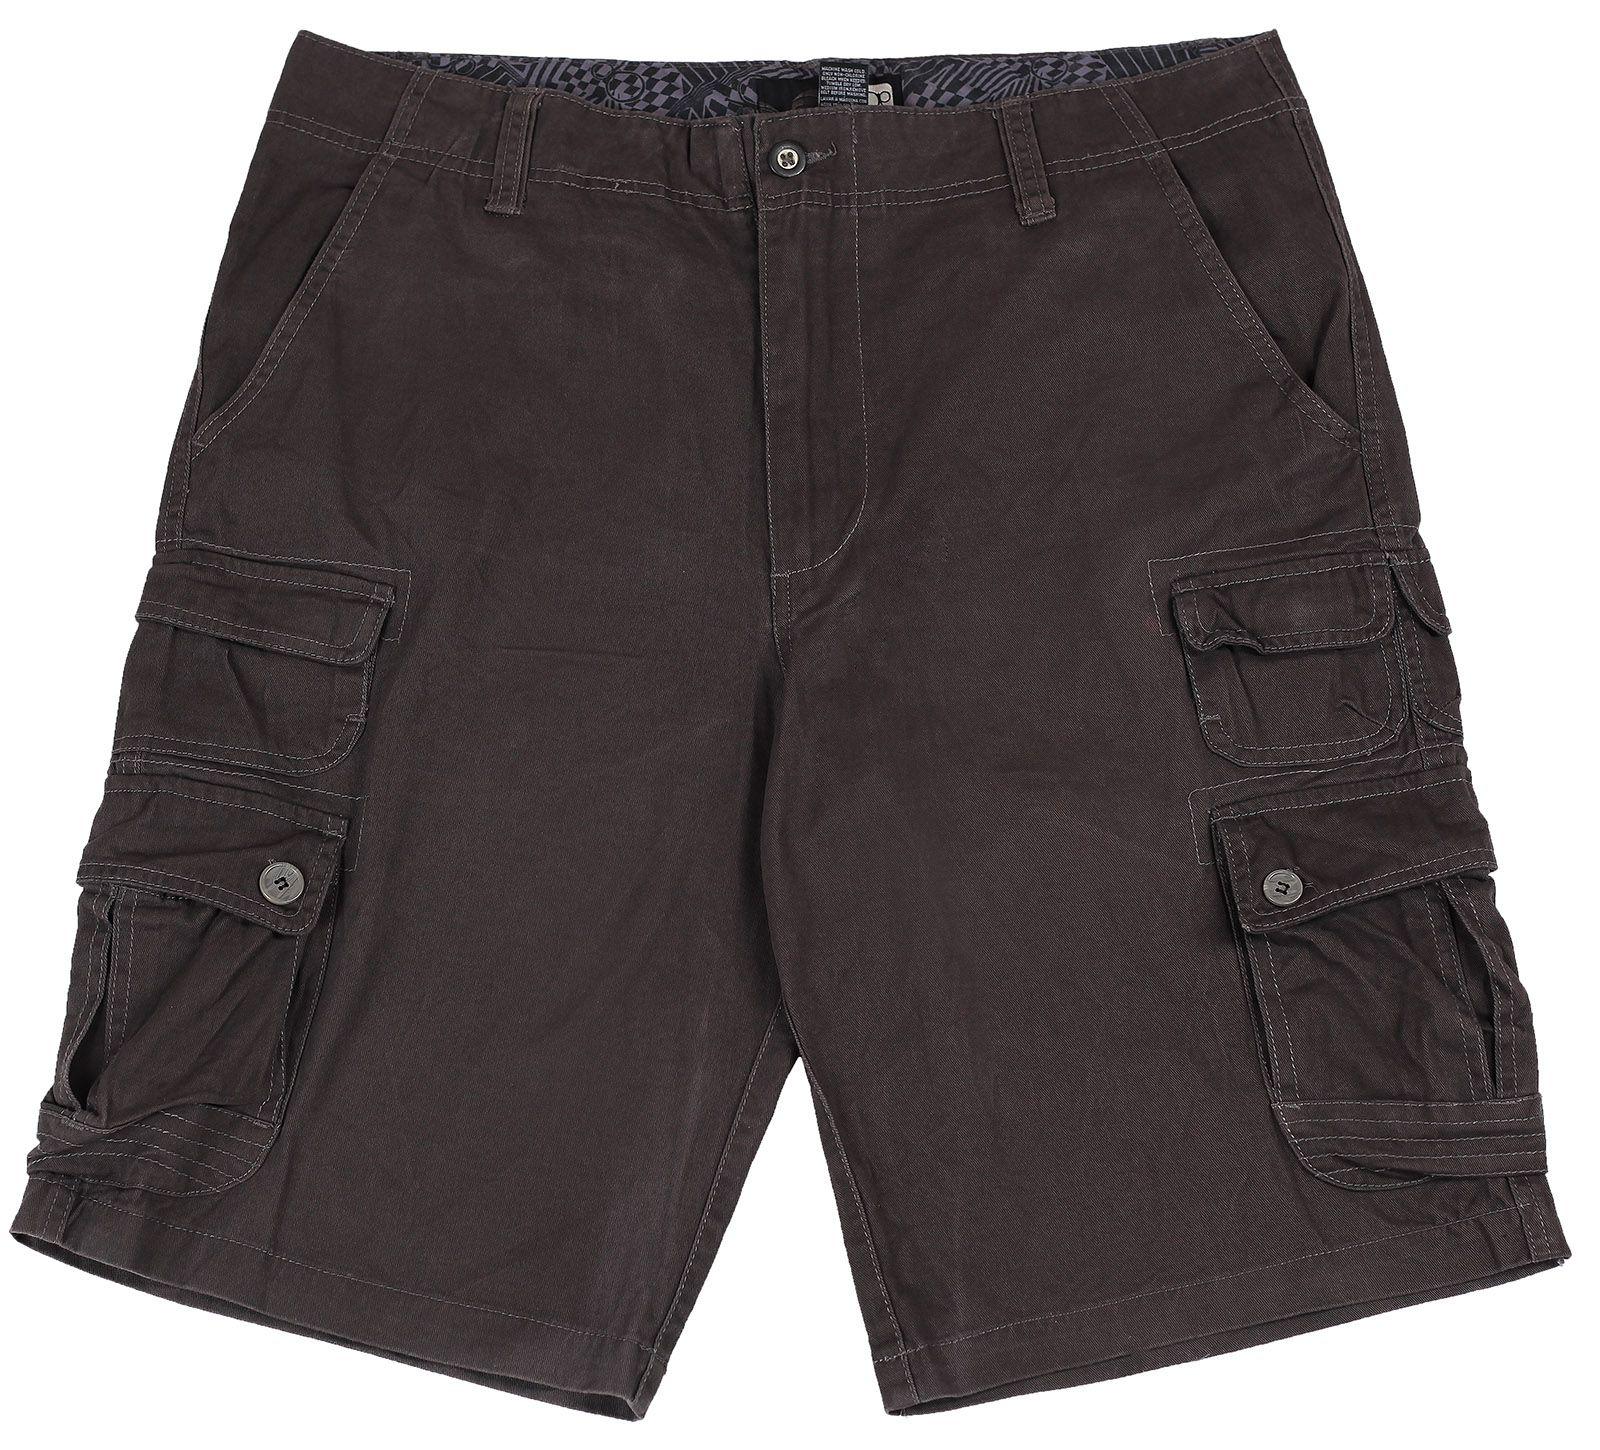 Брендовые мужские шорты от OP®